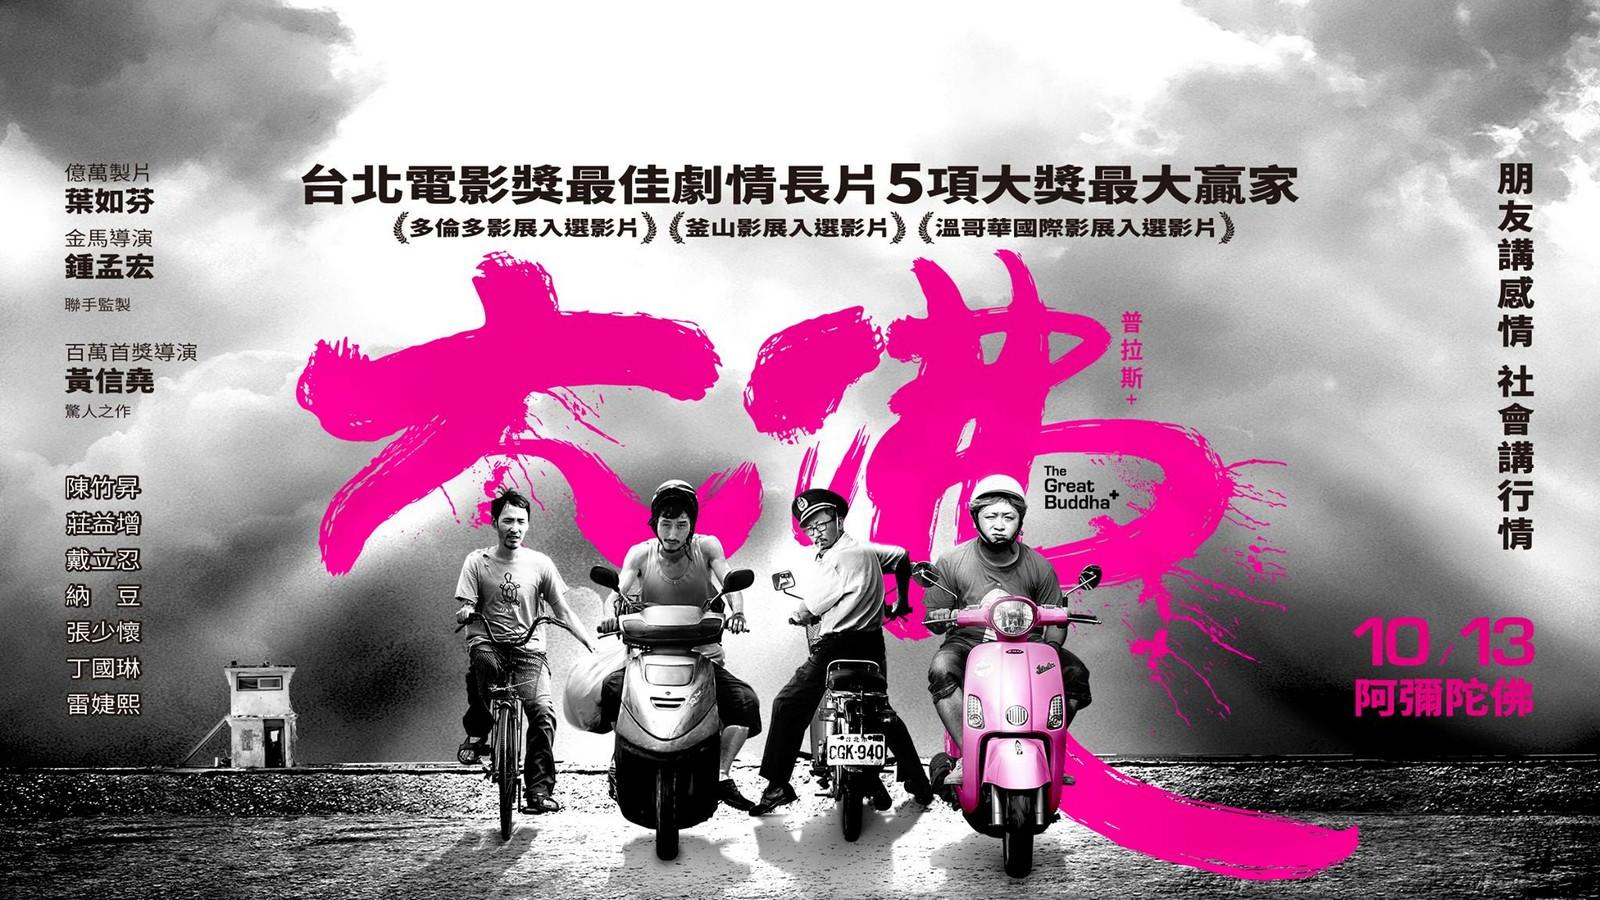 Movie, 大佛普拉斯(台灣, 2017年) / The Great Buddha+(英文), 電影海報, 台灣, 橫版